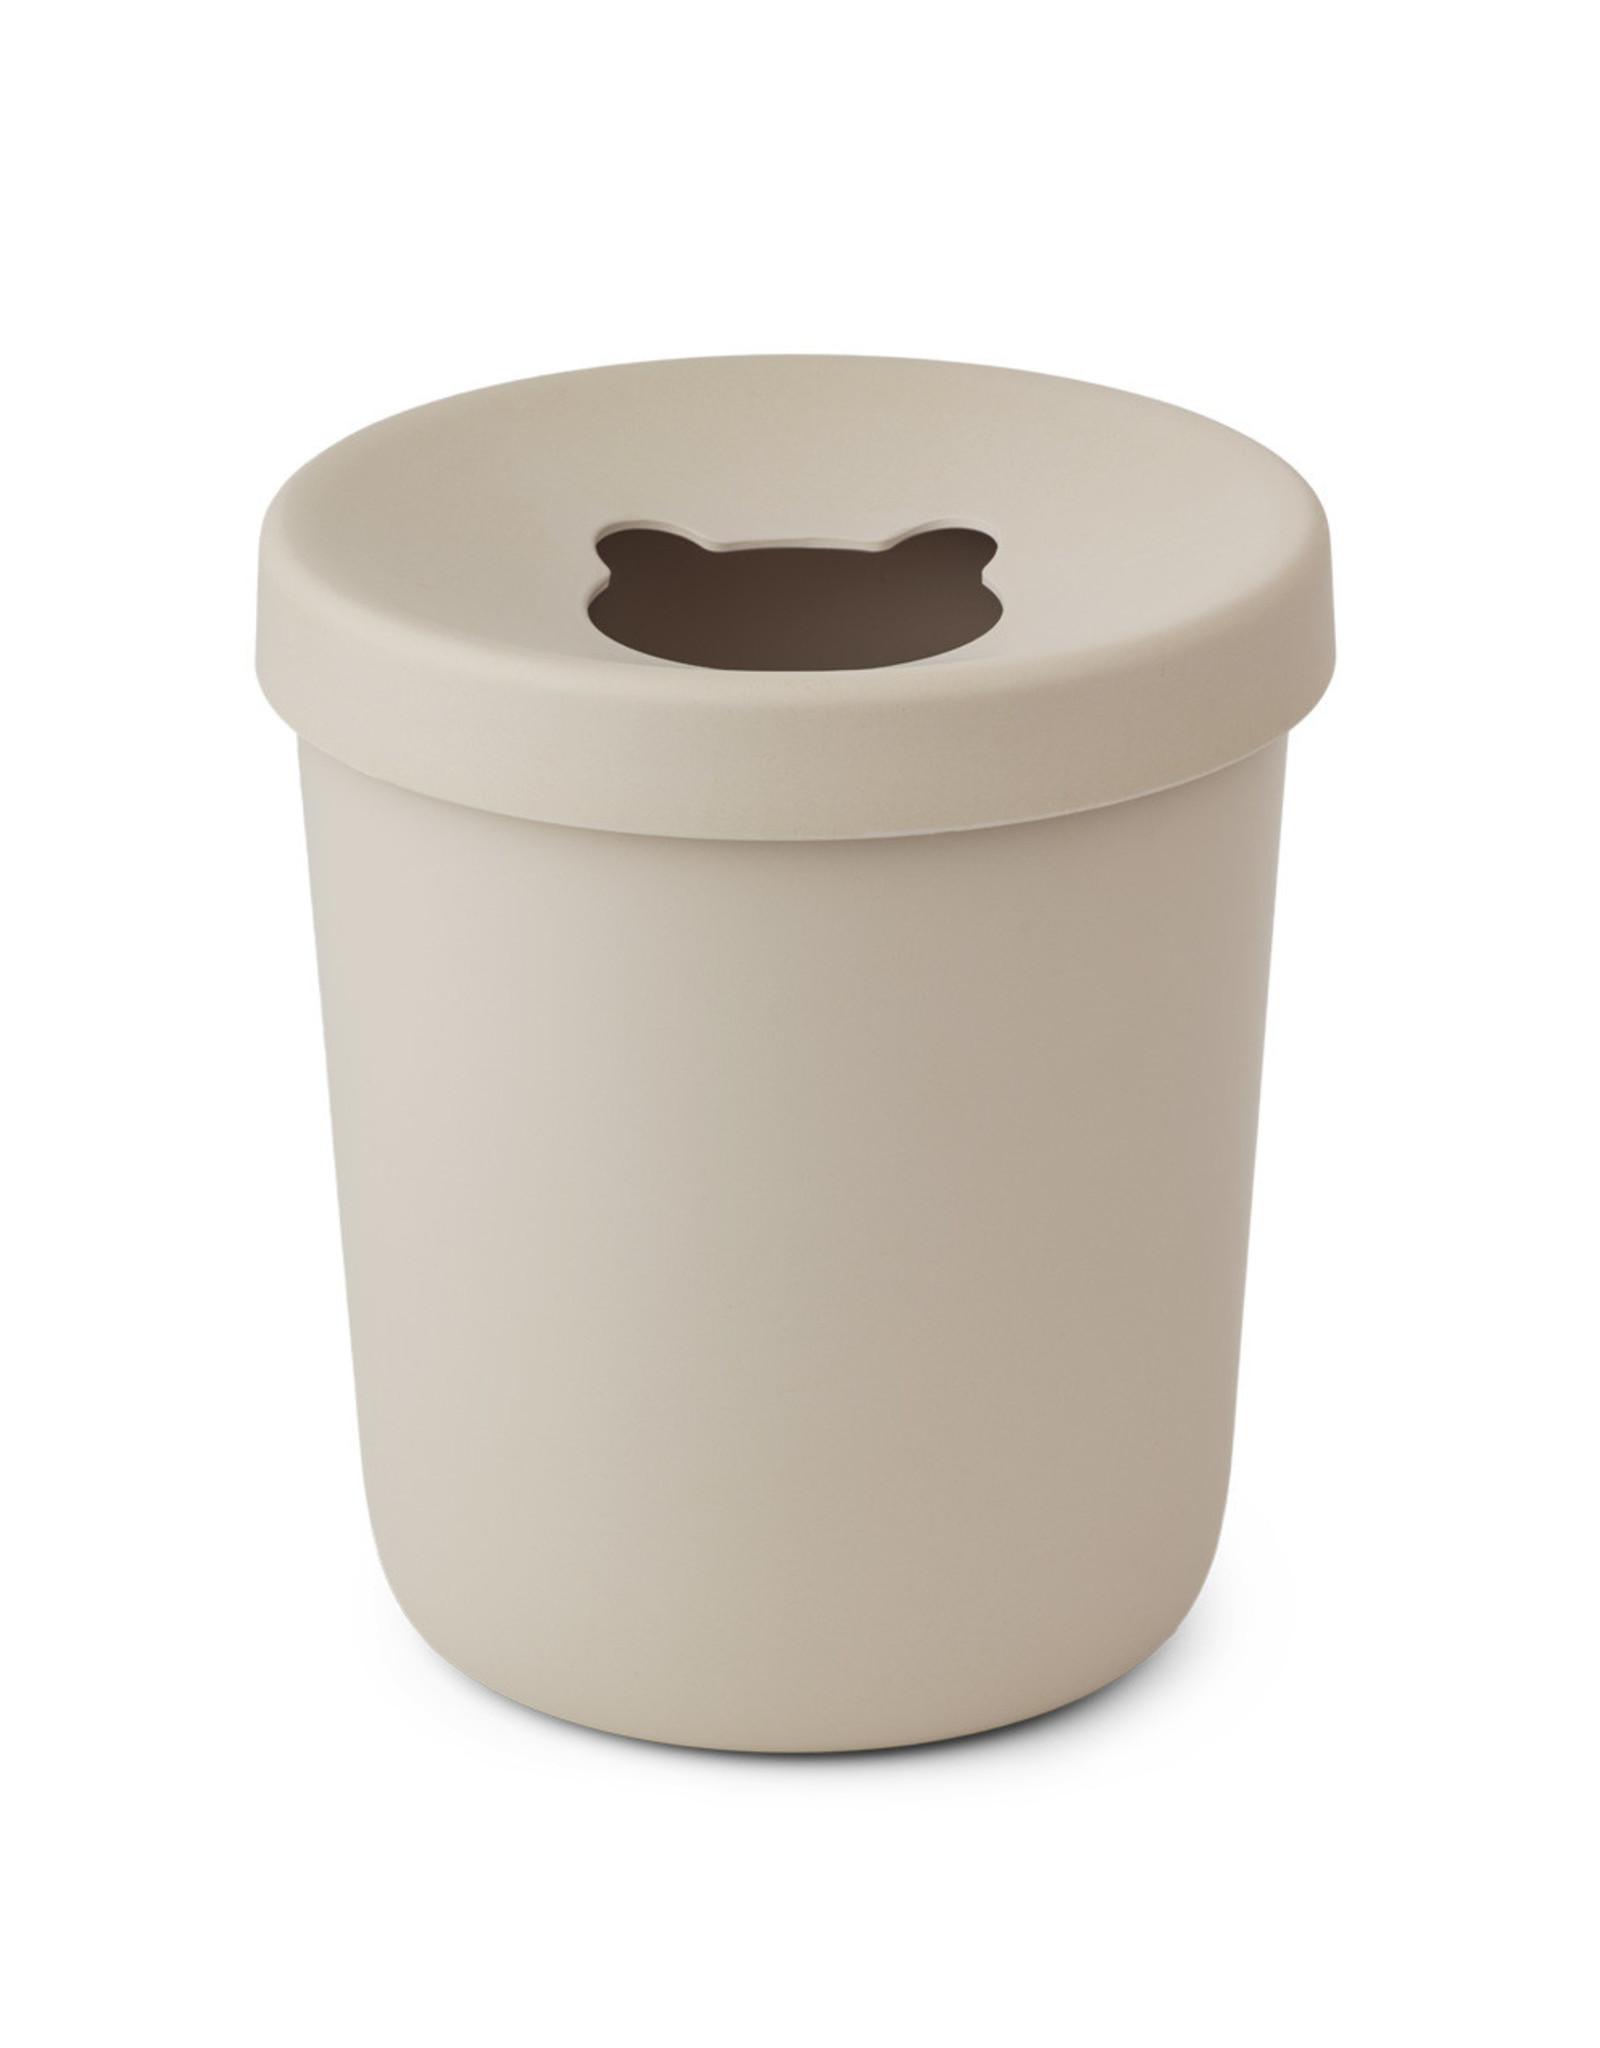 Liewood Liewood Evelina trash bin sandy